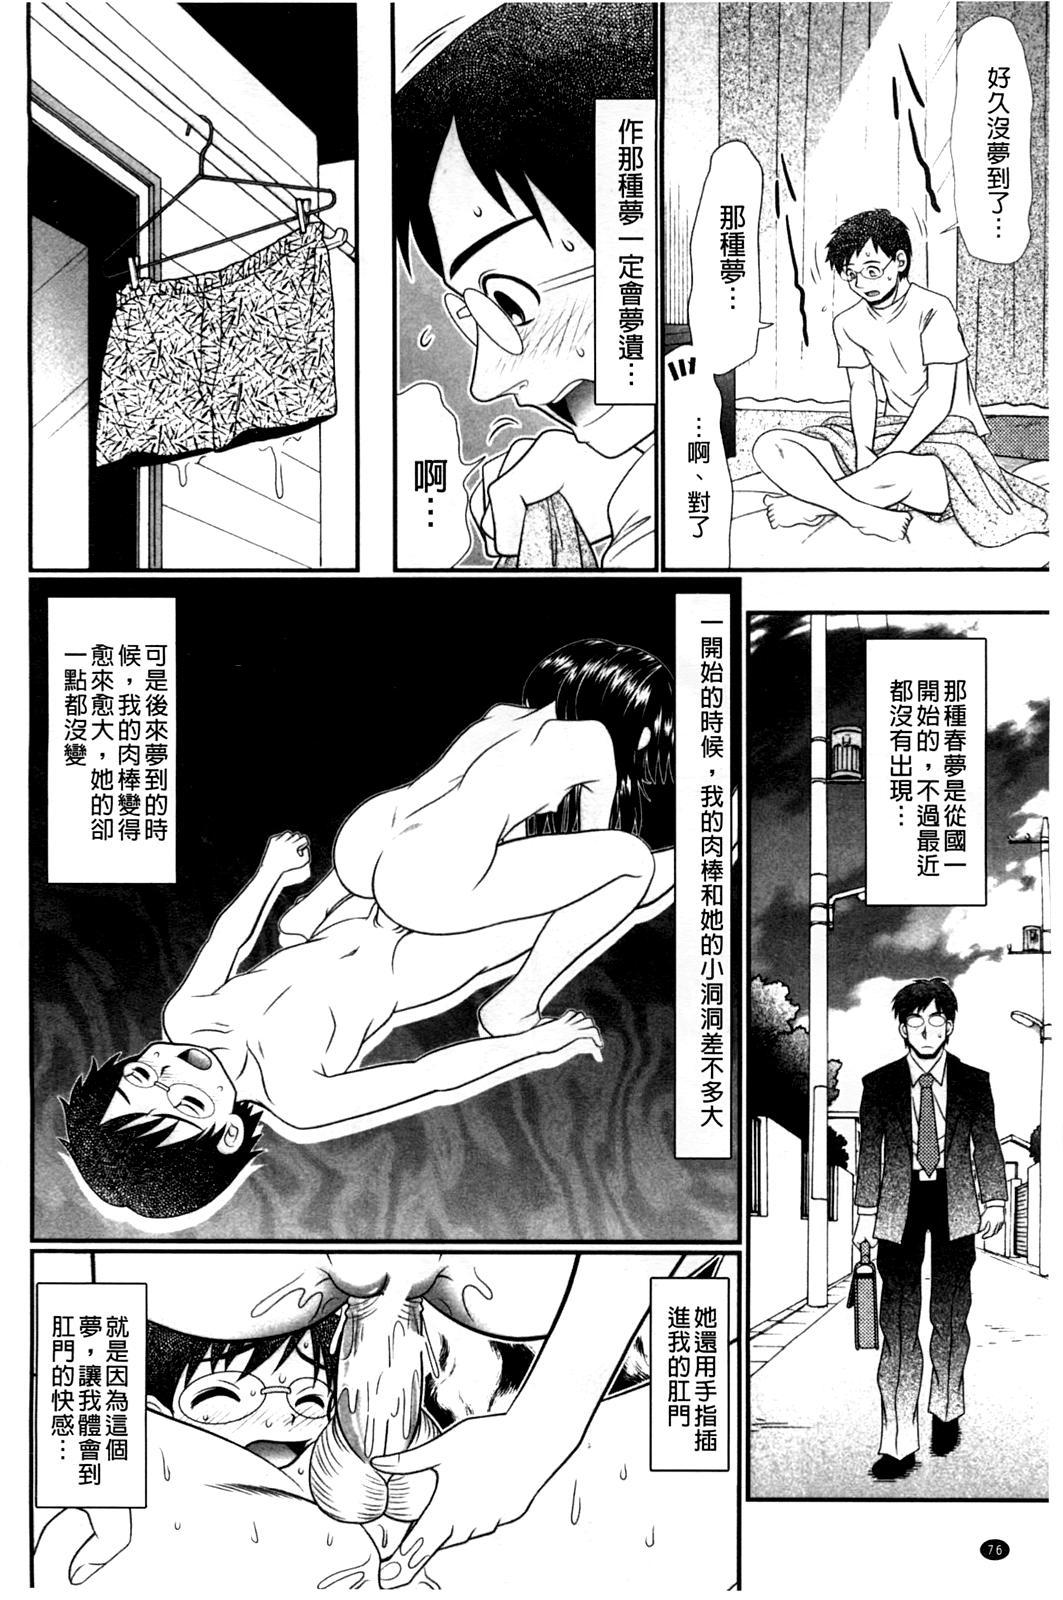 Higyaku Kyoushitsu 78